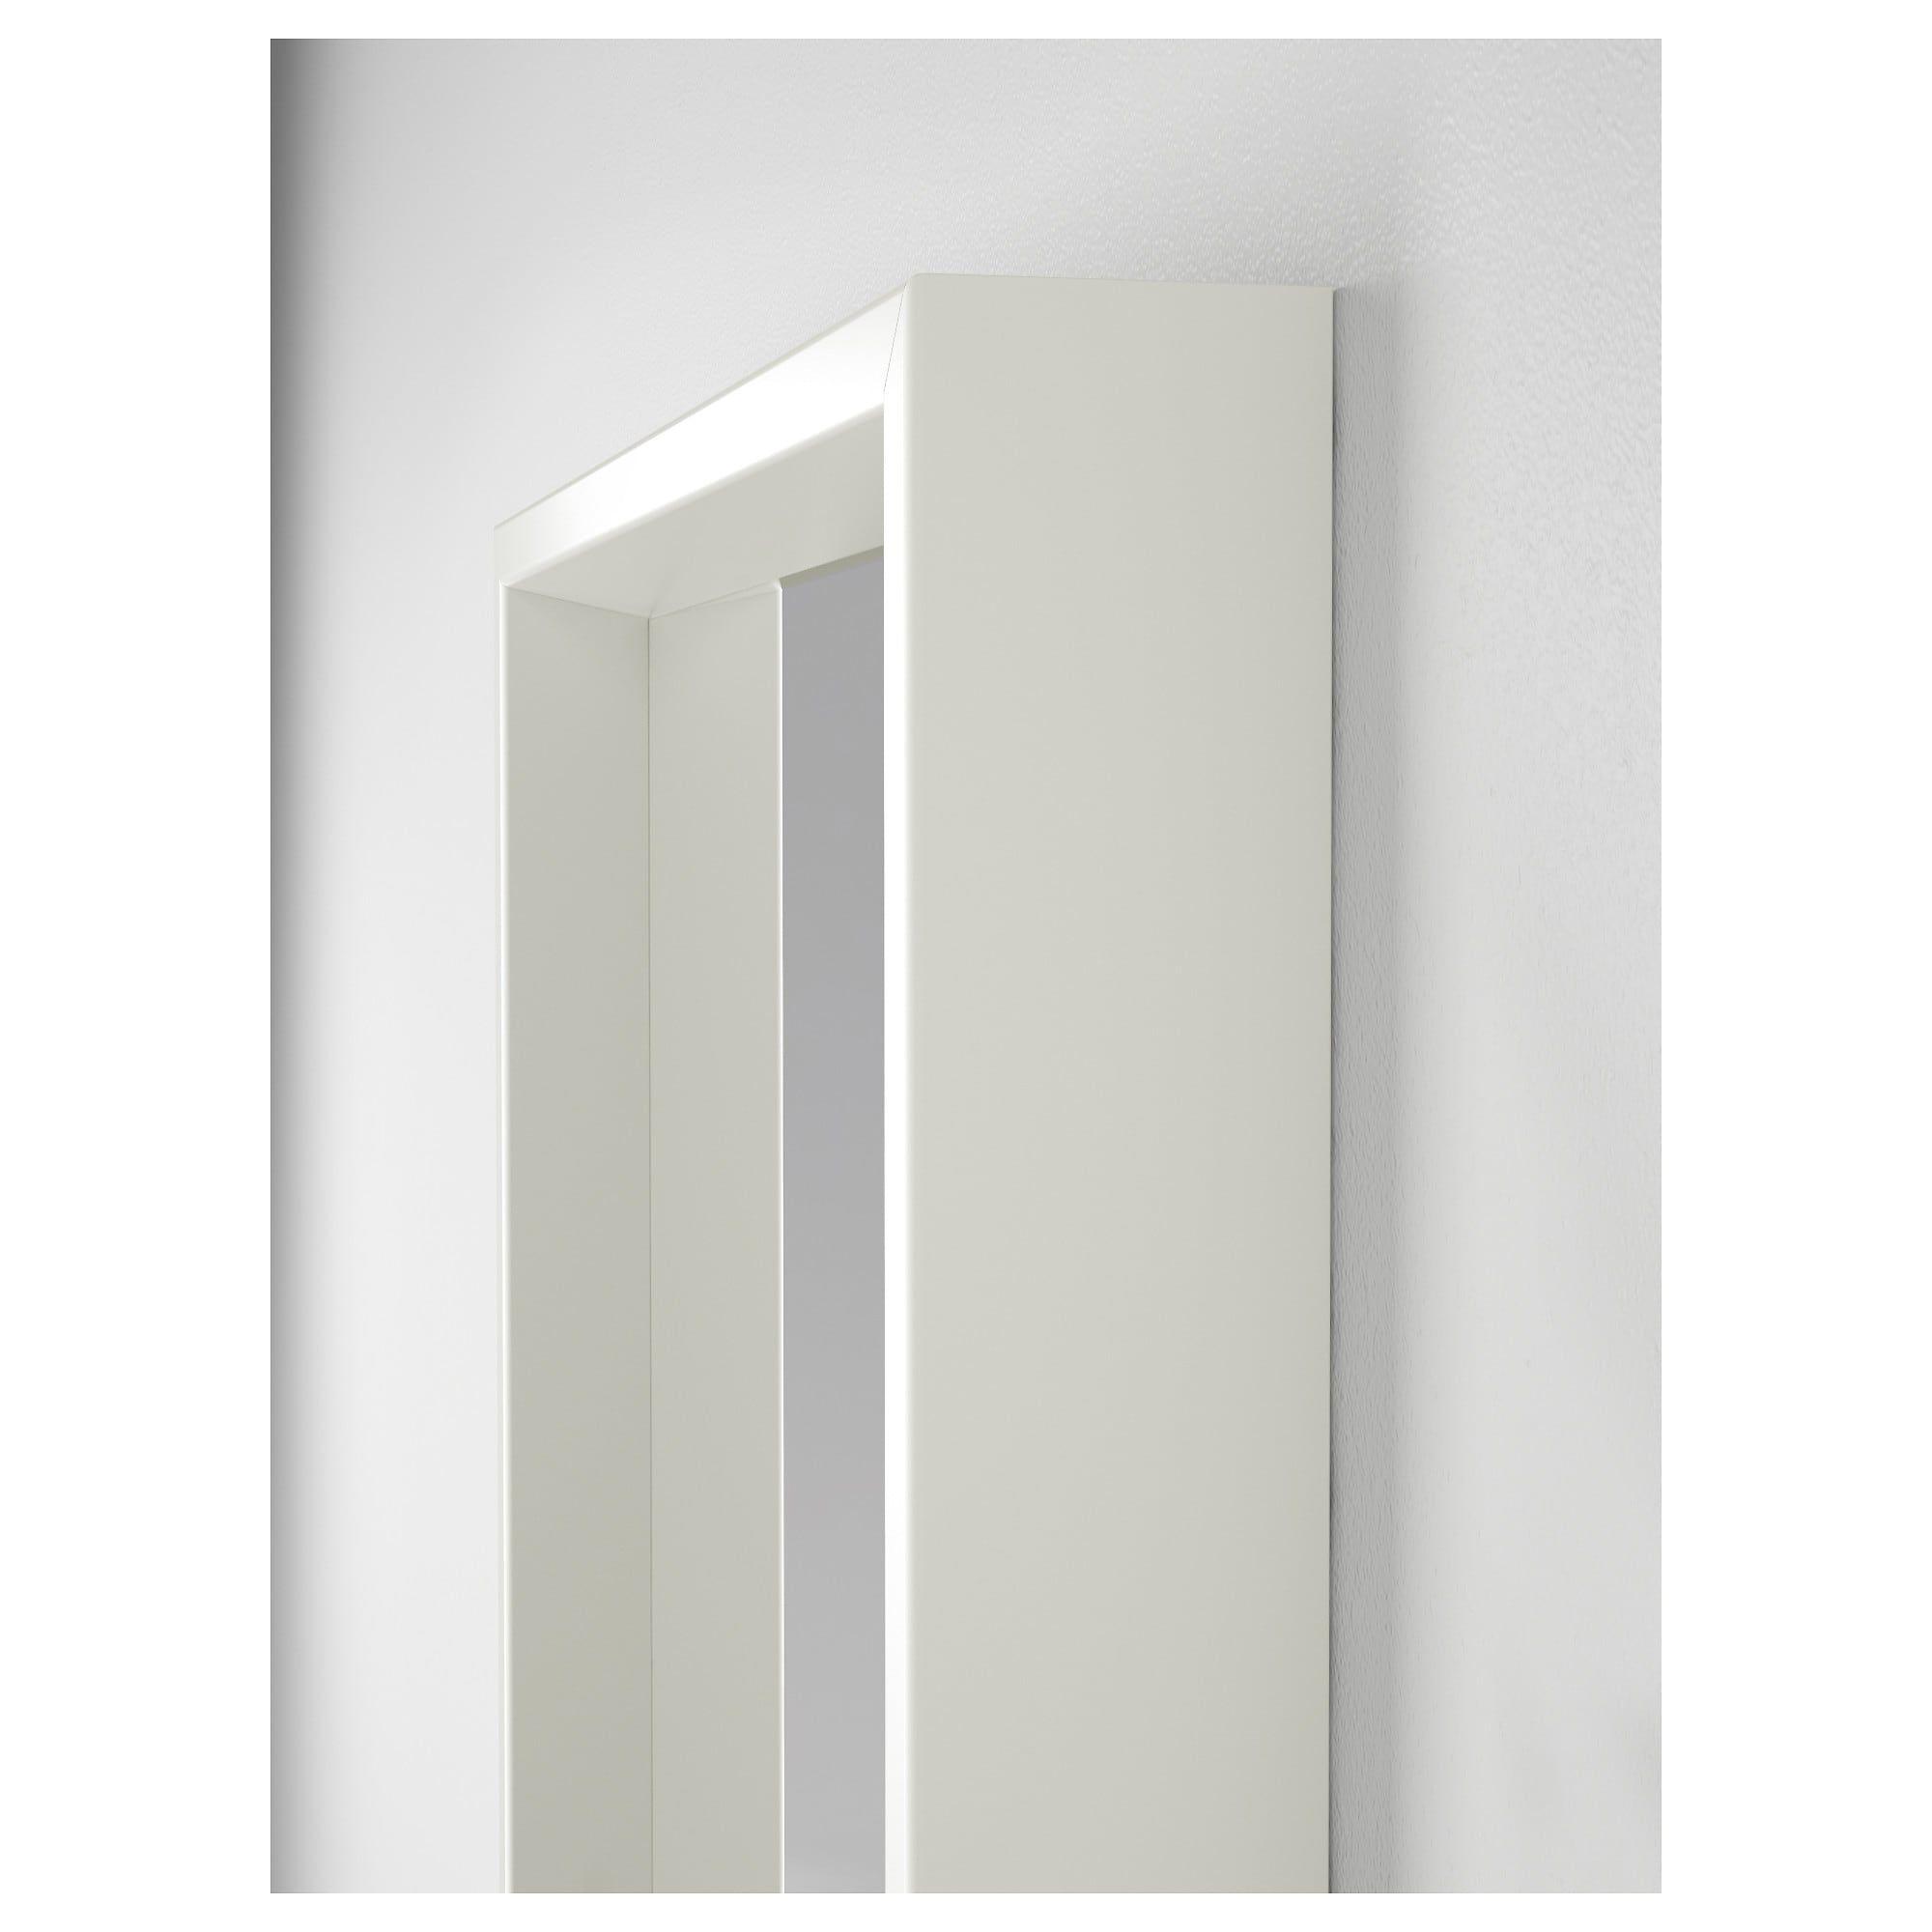 Nissedal Spiegel Wit 40x150 Cm Ikea Spiegel Spiegelglas Grote Spiegel